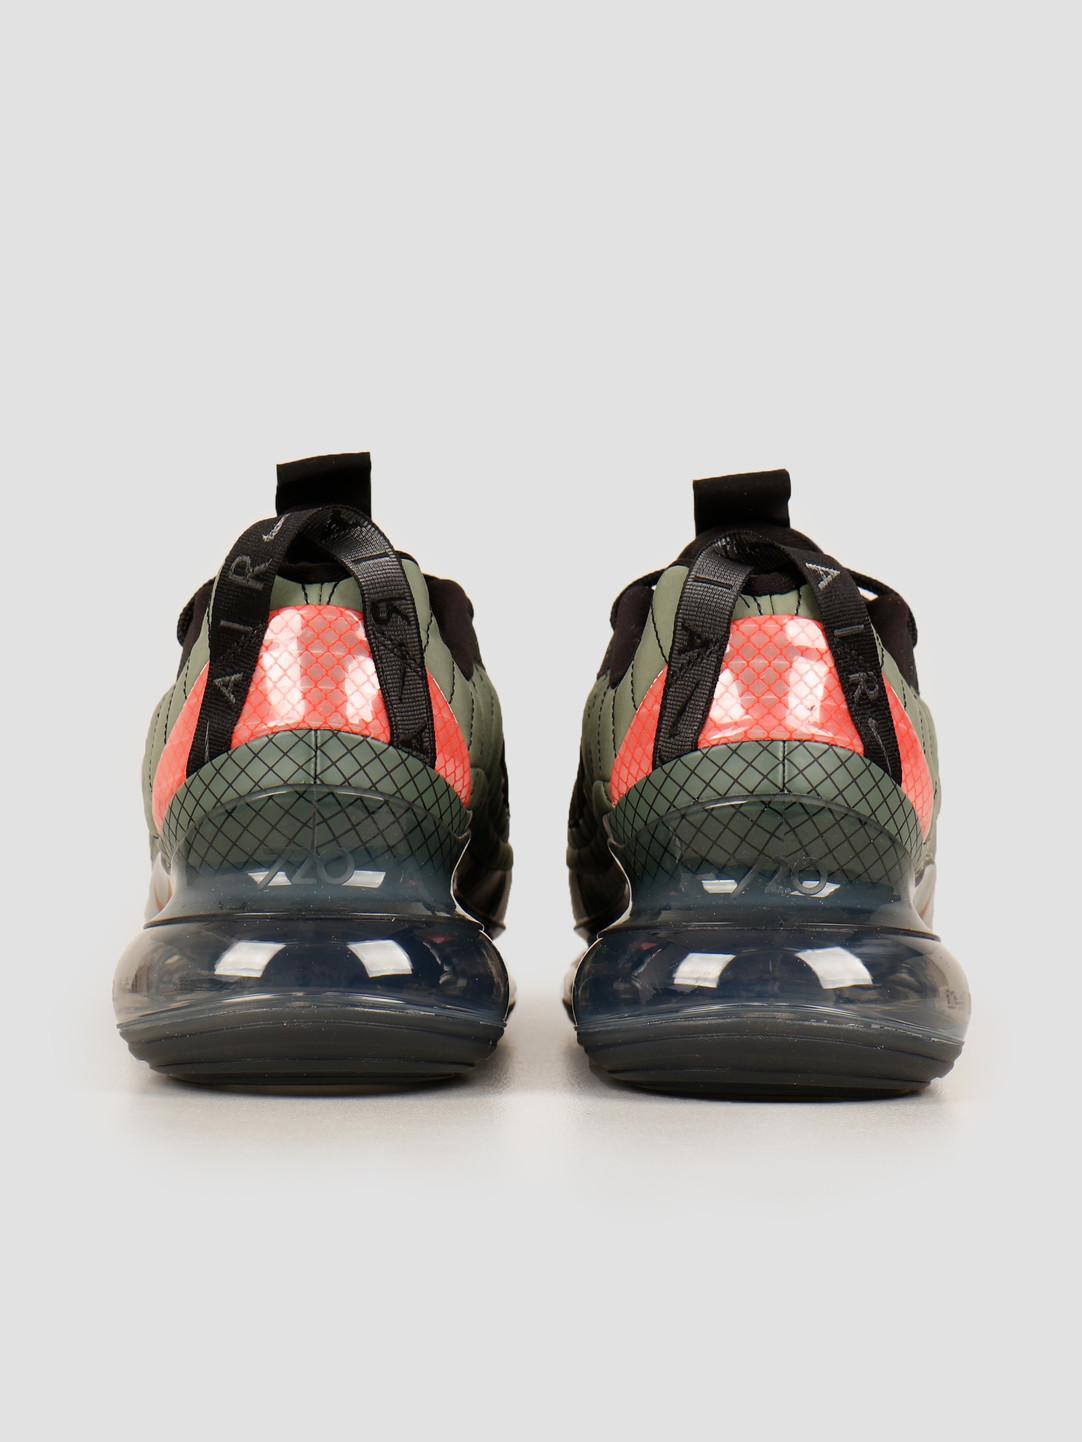 Nike Nike Mx 720 818 Jade Stone Team Orange Juniper Fog Black CI3871-300